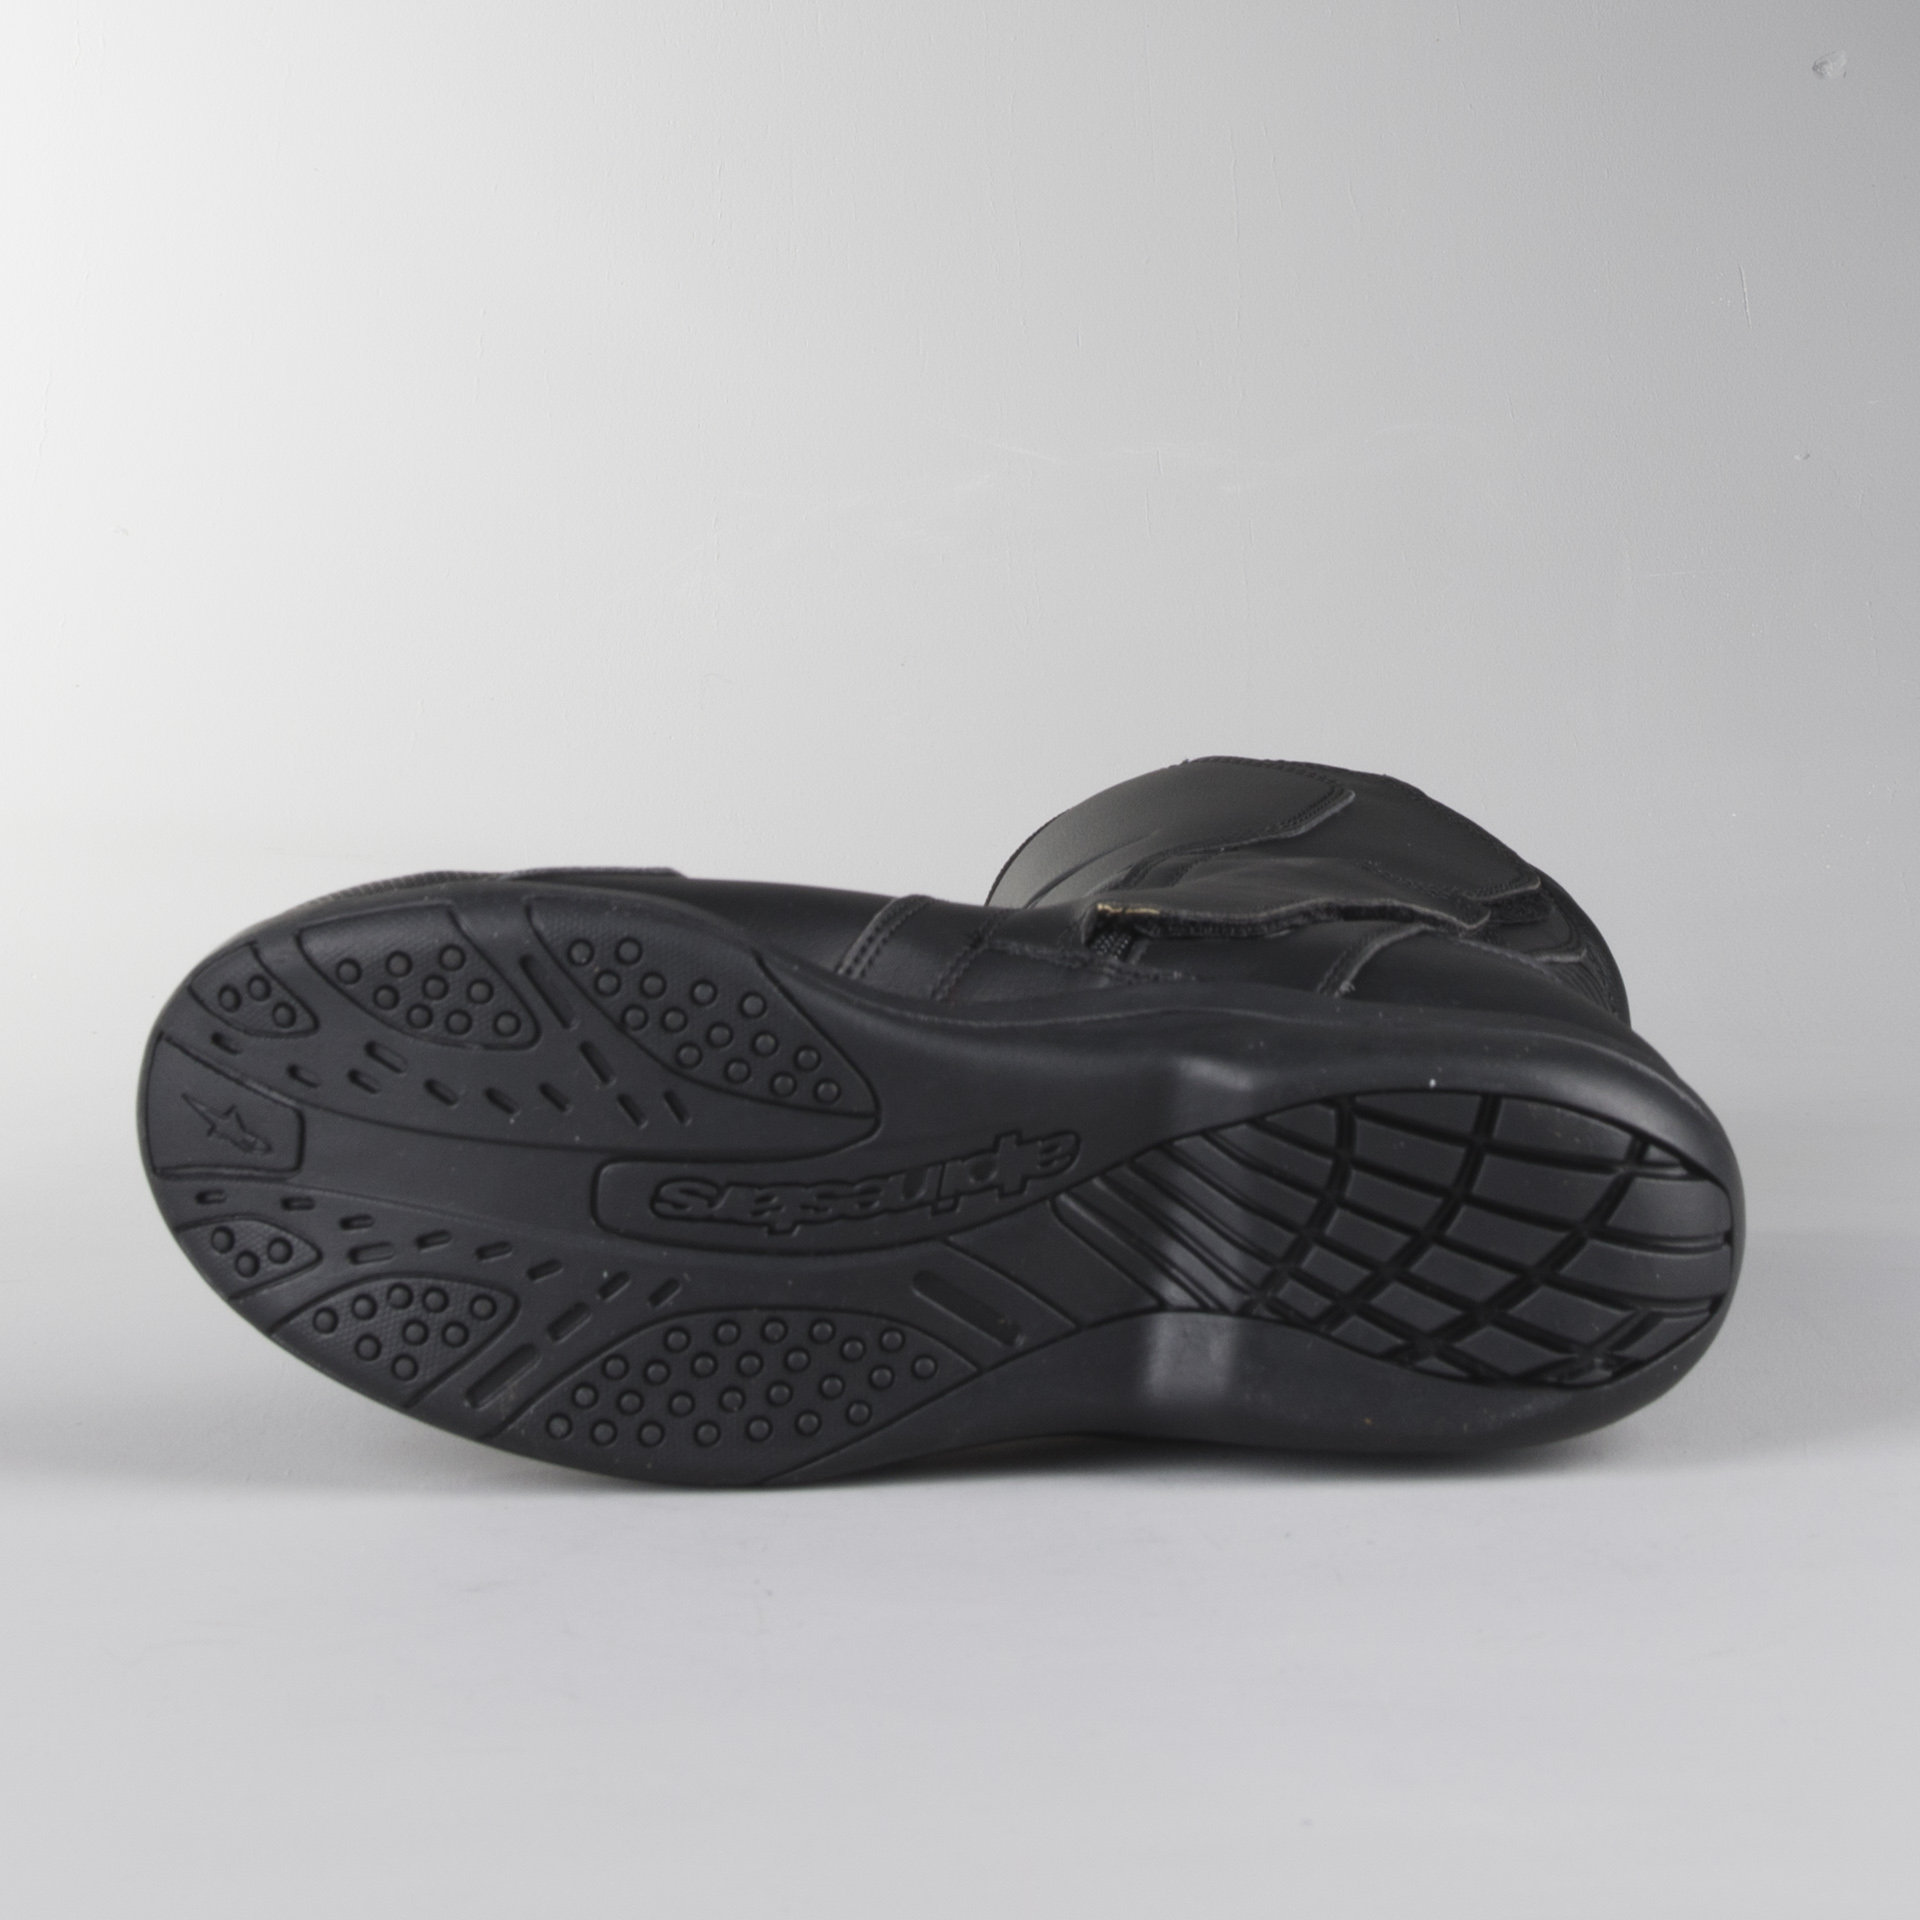 Alpinestars Origin Drystar MC Shoes Black Now 20% Savings